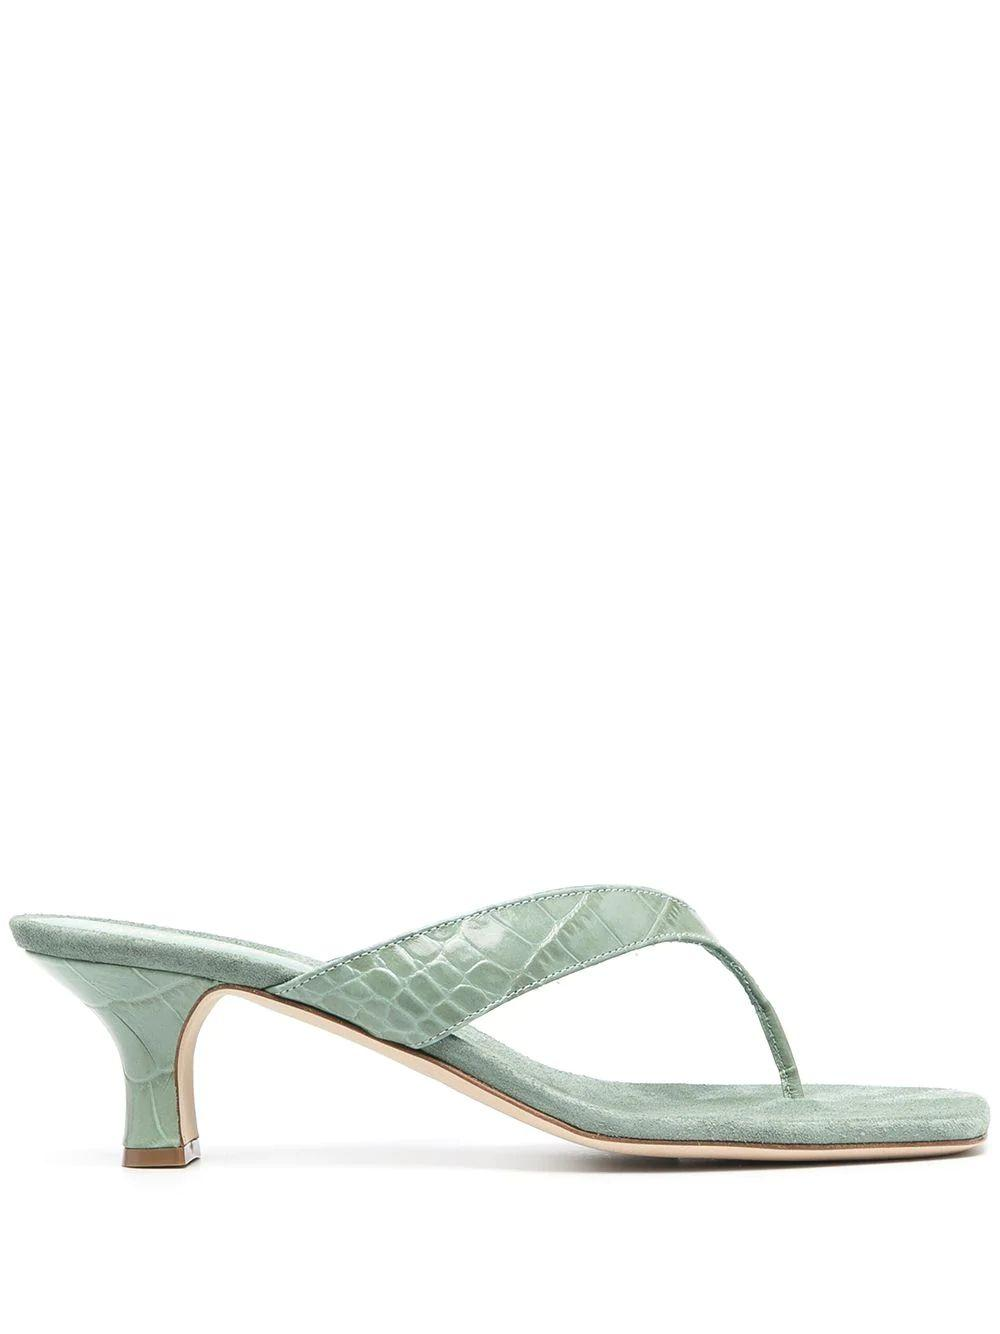 Portofino Thong Sandal Item # PX217V-XCVLR